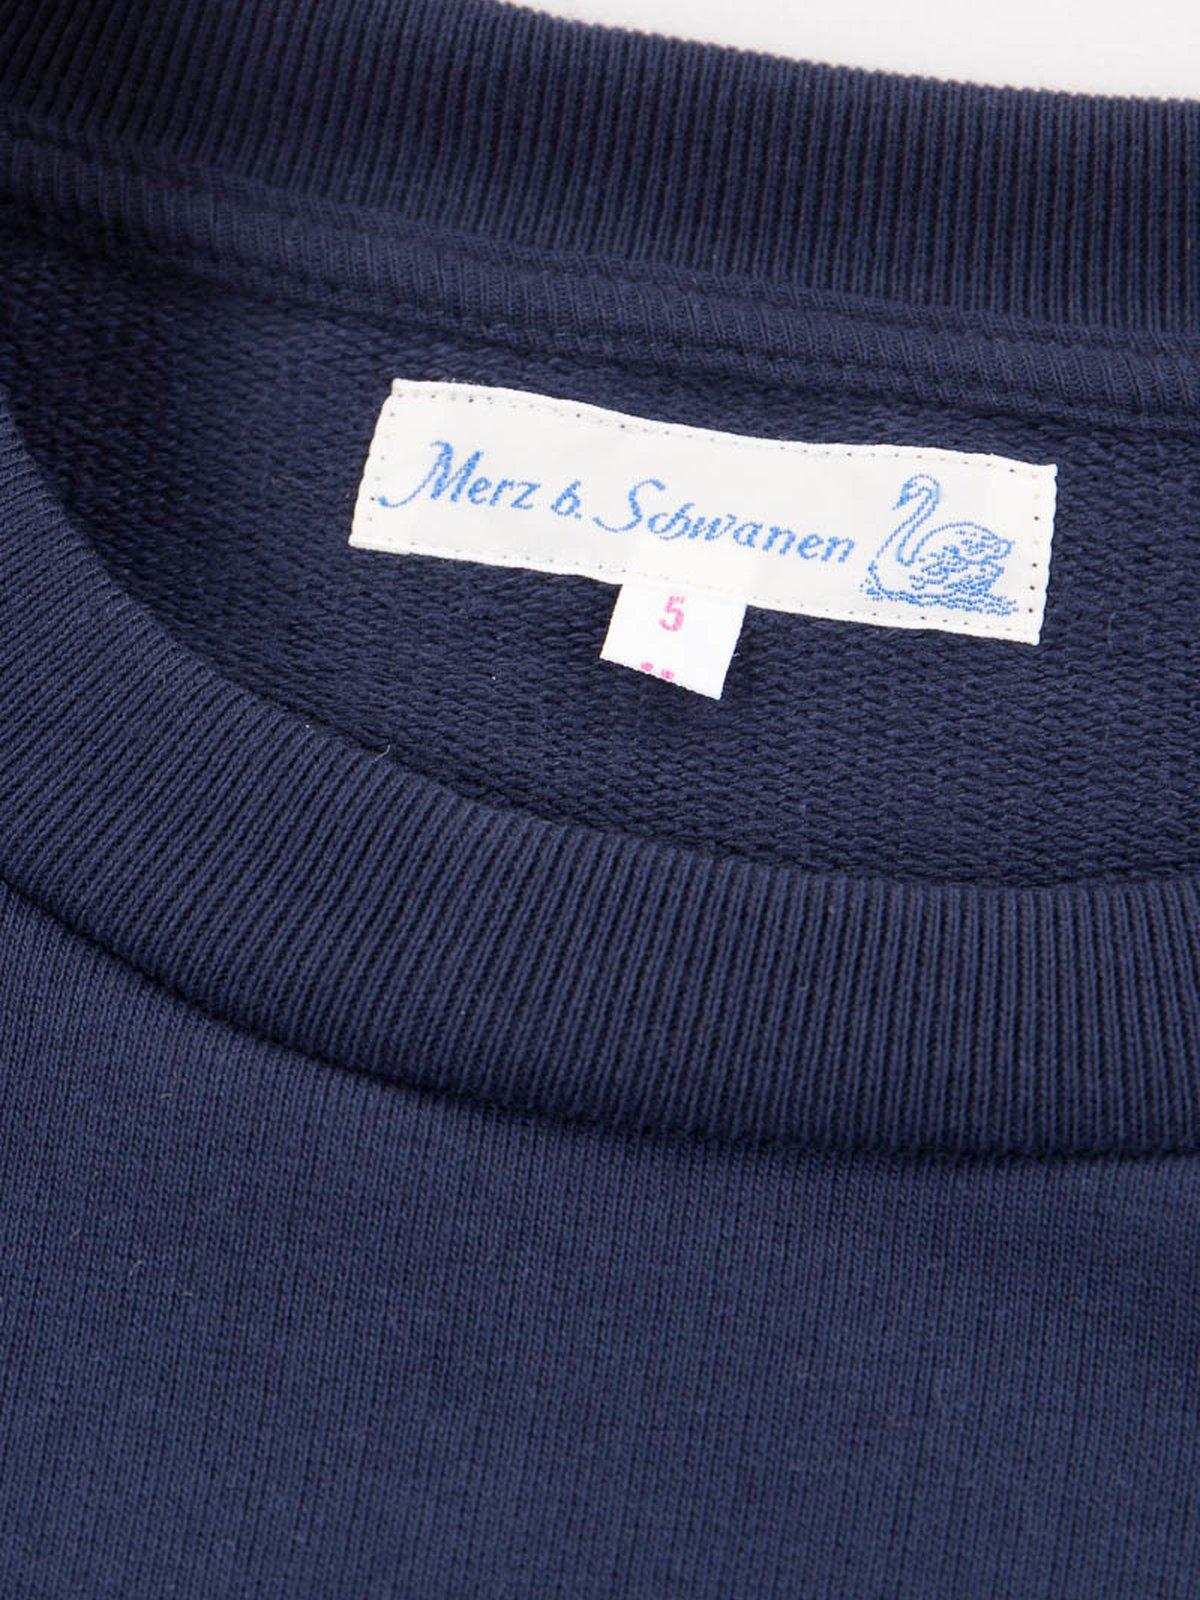 Ink Blue 346OS Organic Cotton Oversized Sweater - Image 4